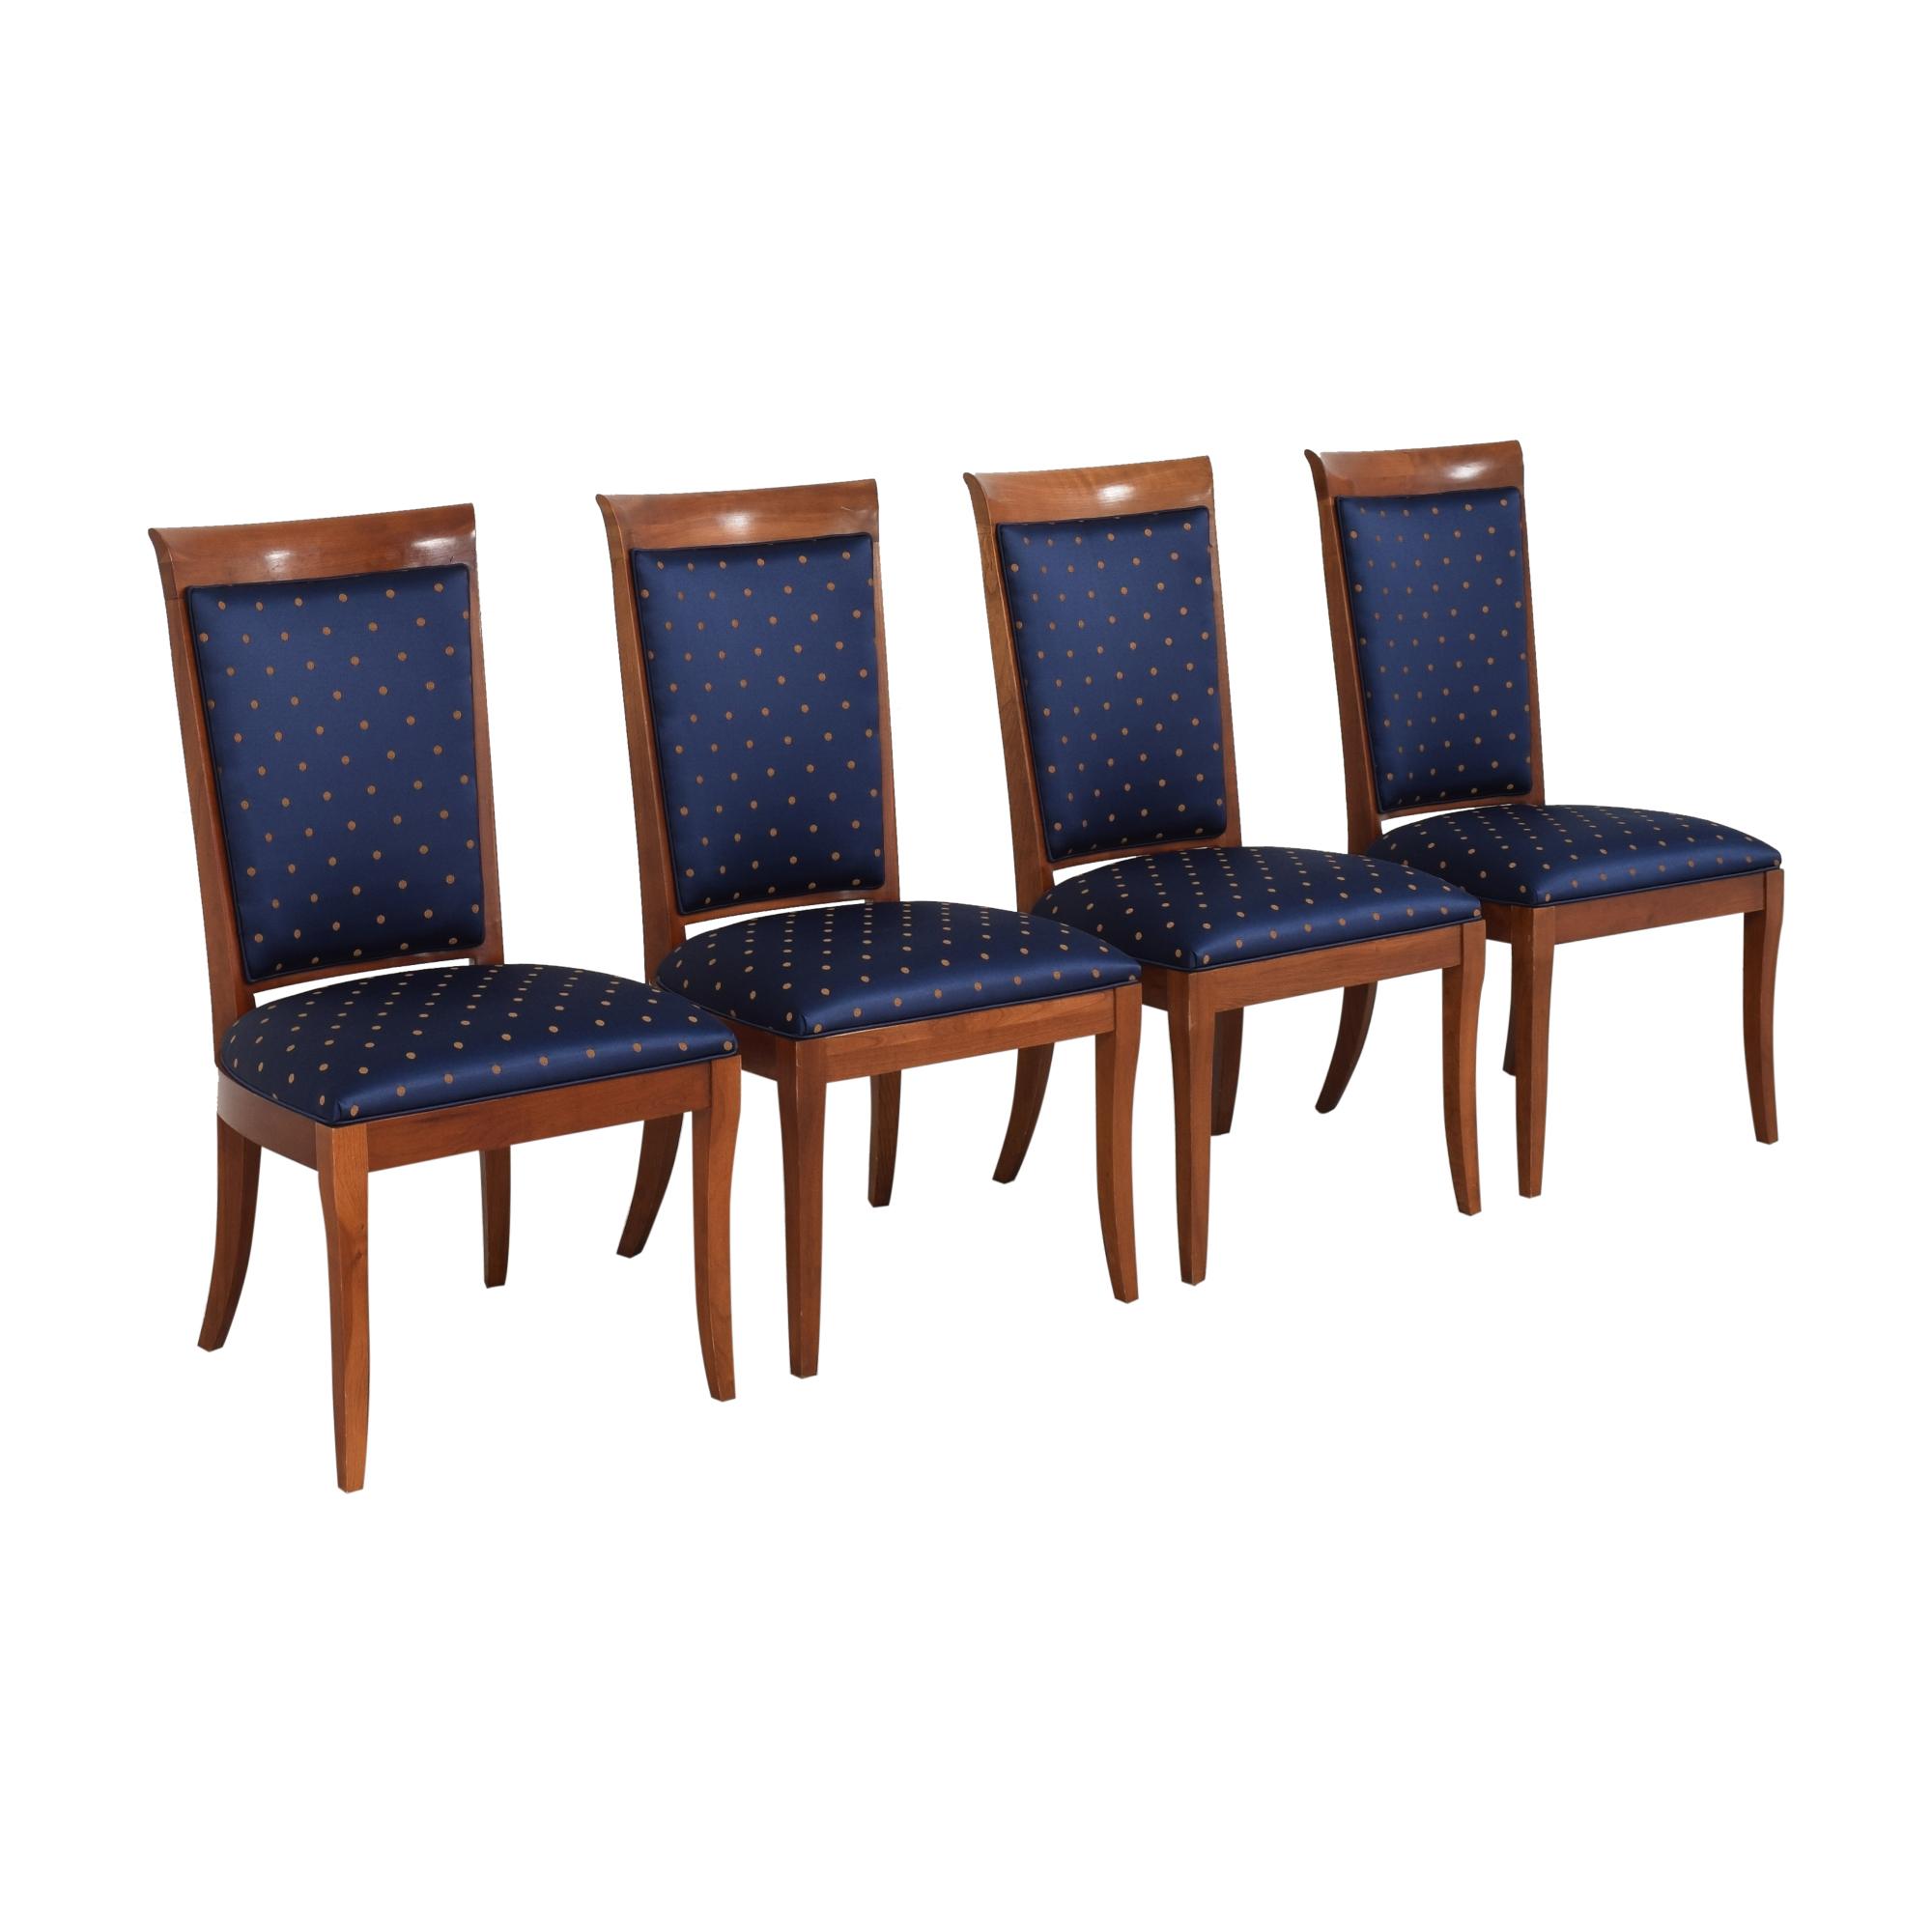 shop Ethan Allen Medallion Collection Dining Side Chairs Ethan Allen Dining Chairs